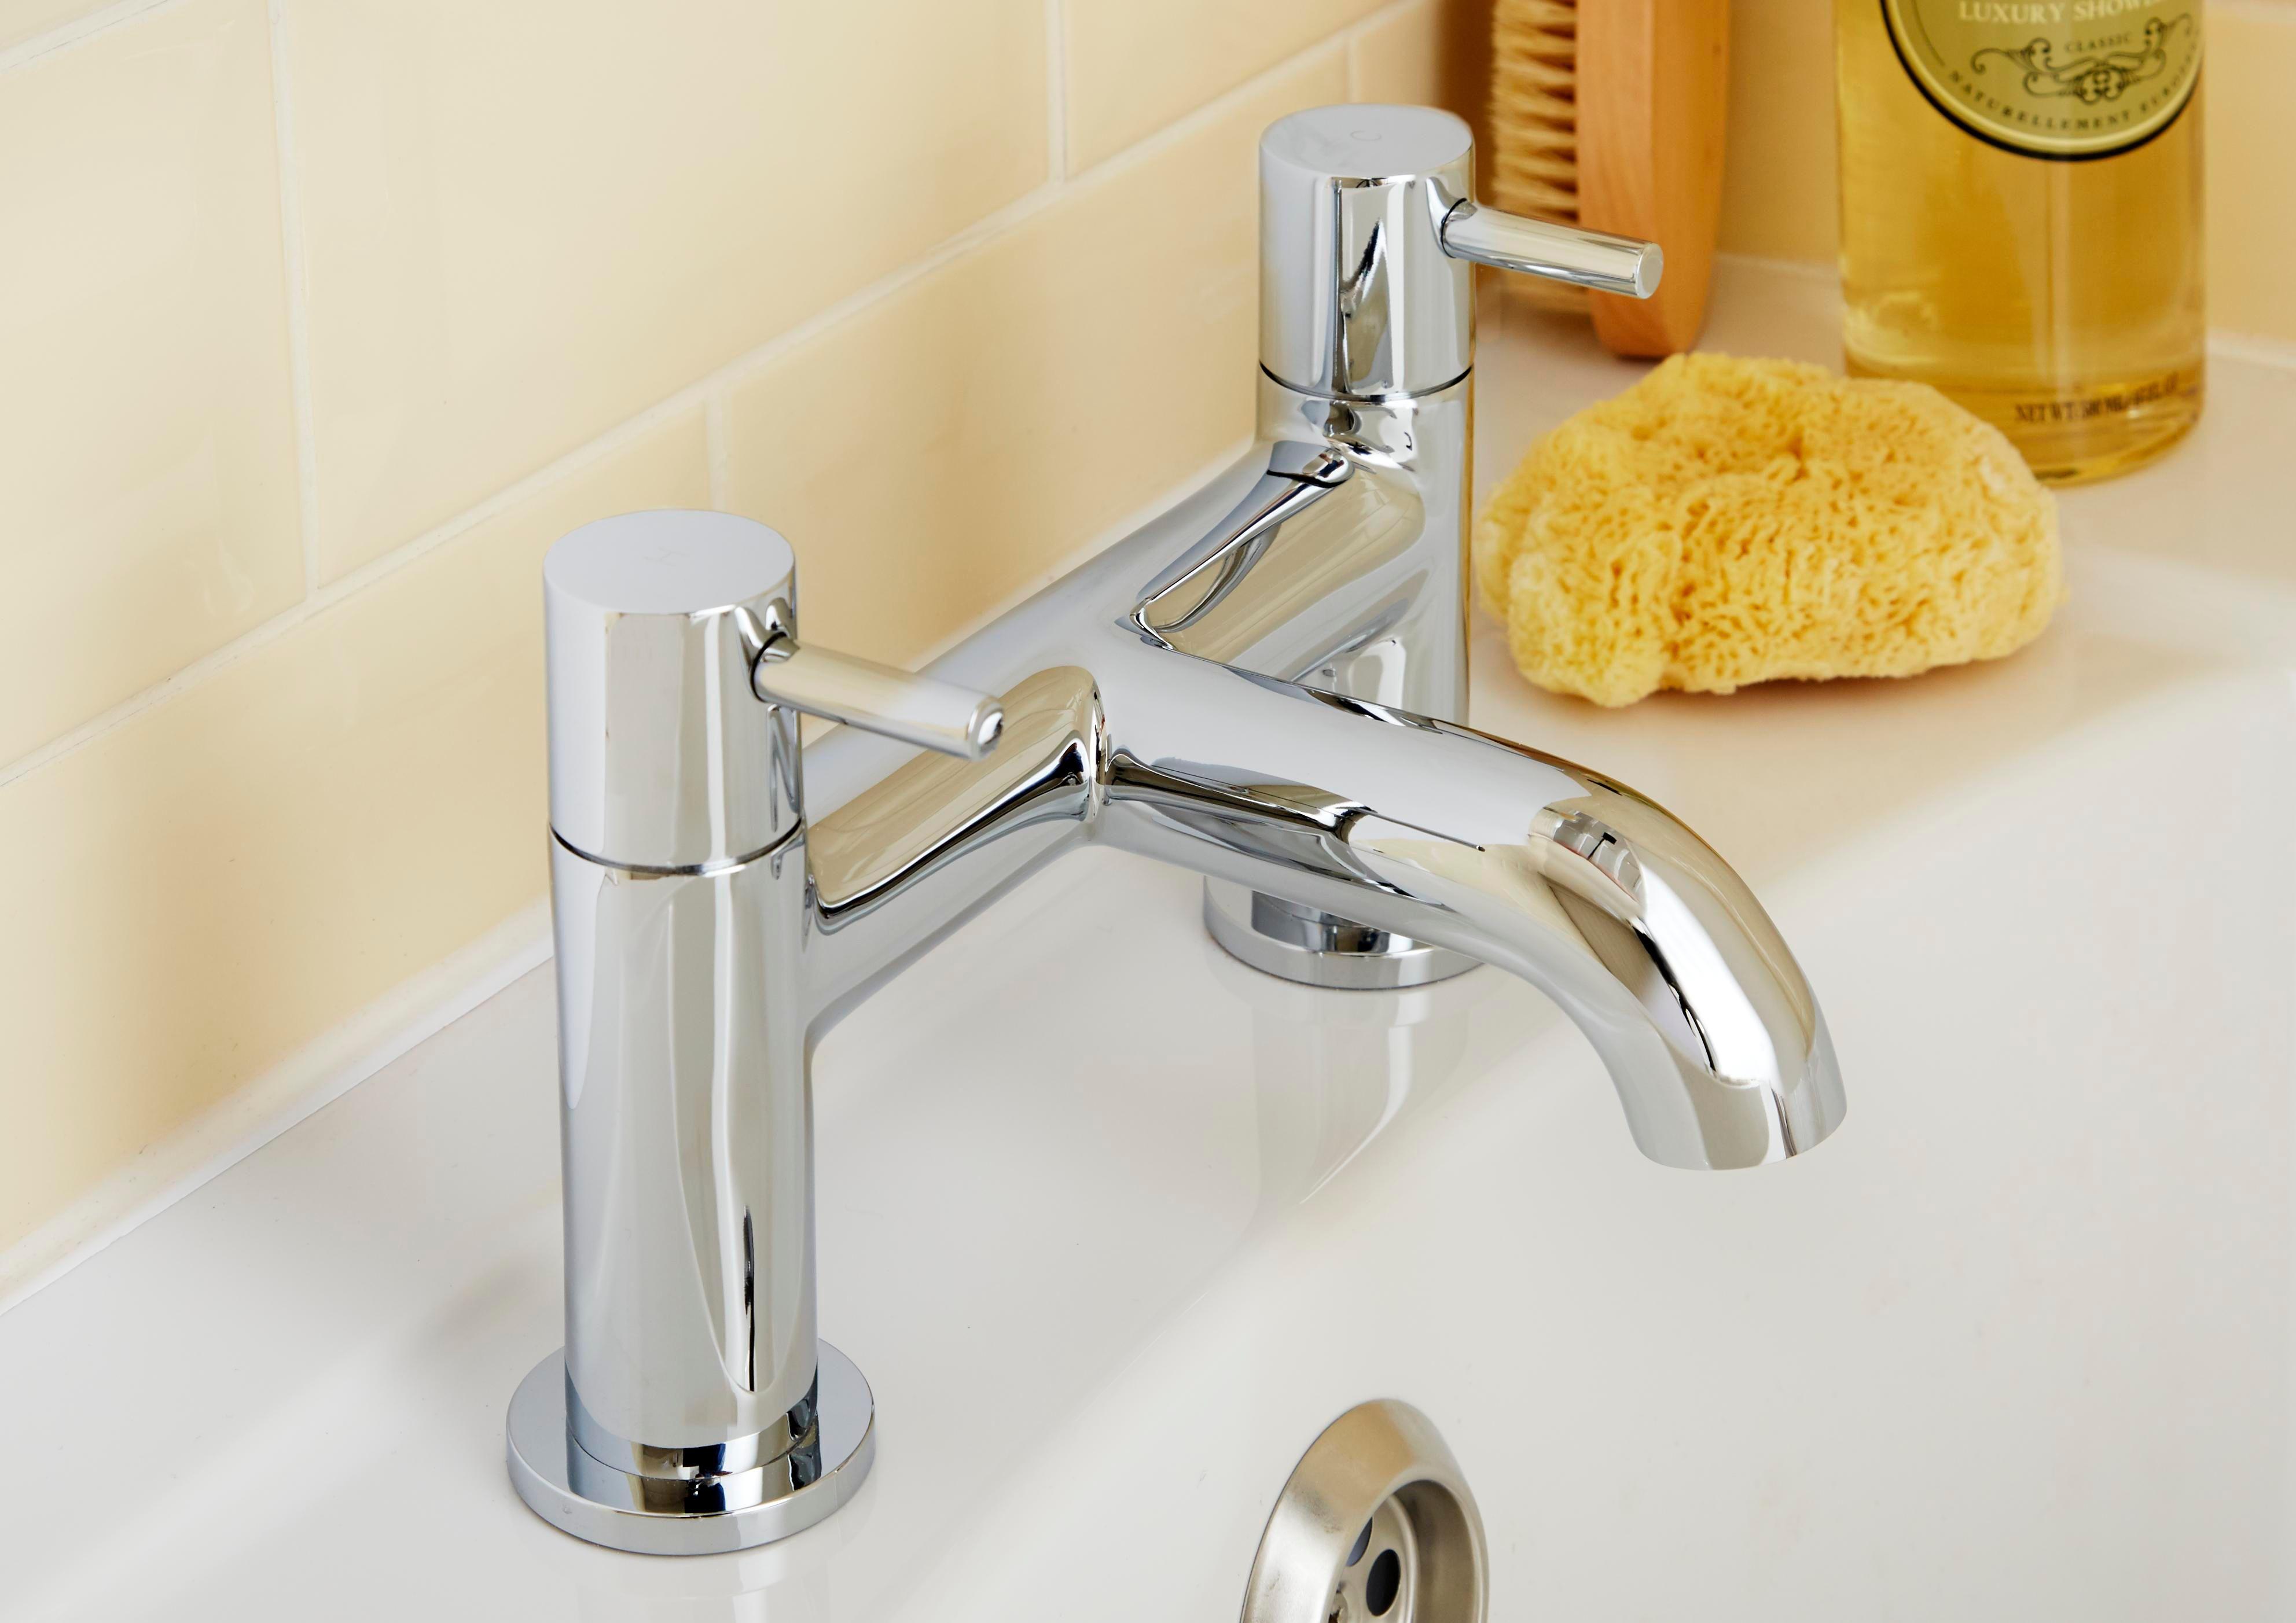 bath taps QNILFVB